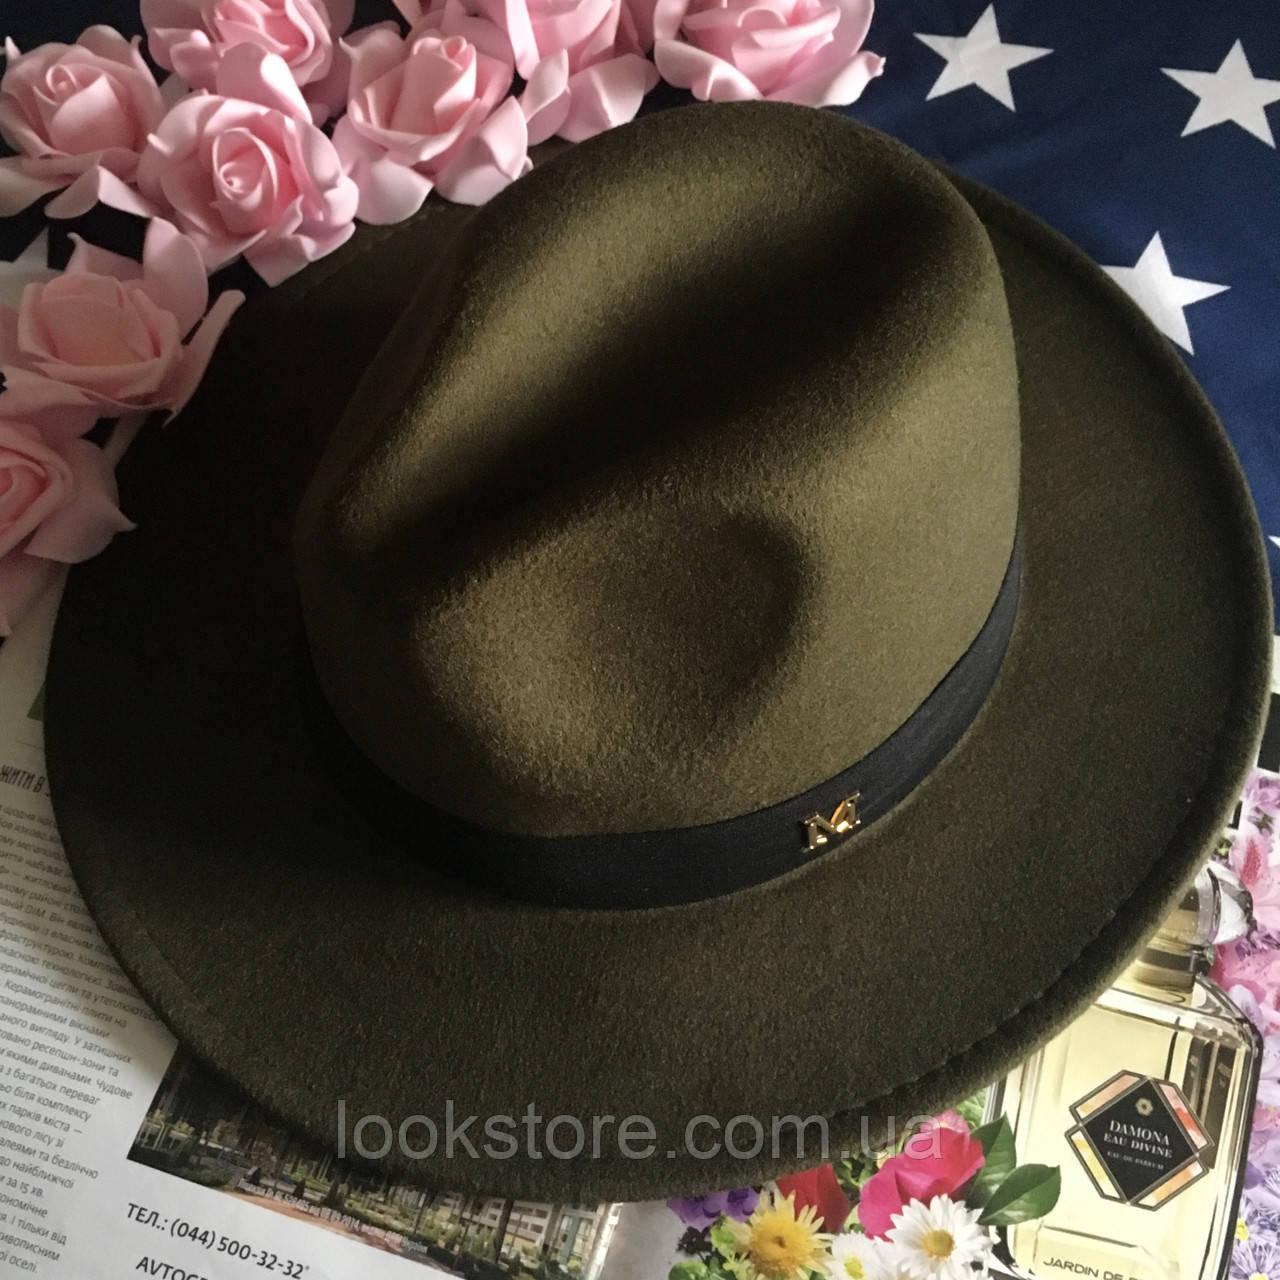 Шляпа Федора унисекс с устойчивыми полями в стиле Maison Michel зеленая (хаки)